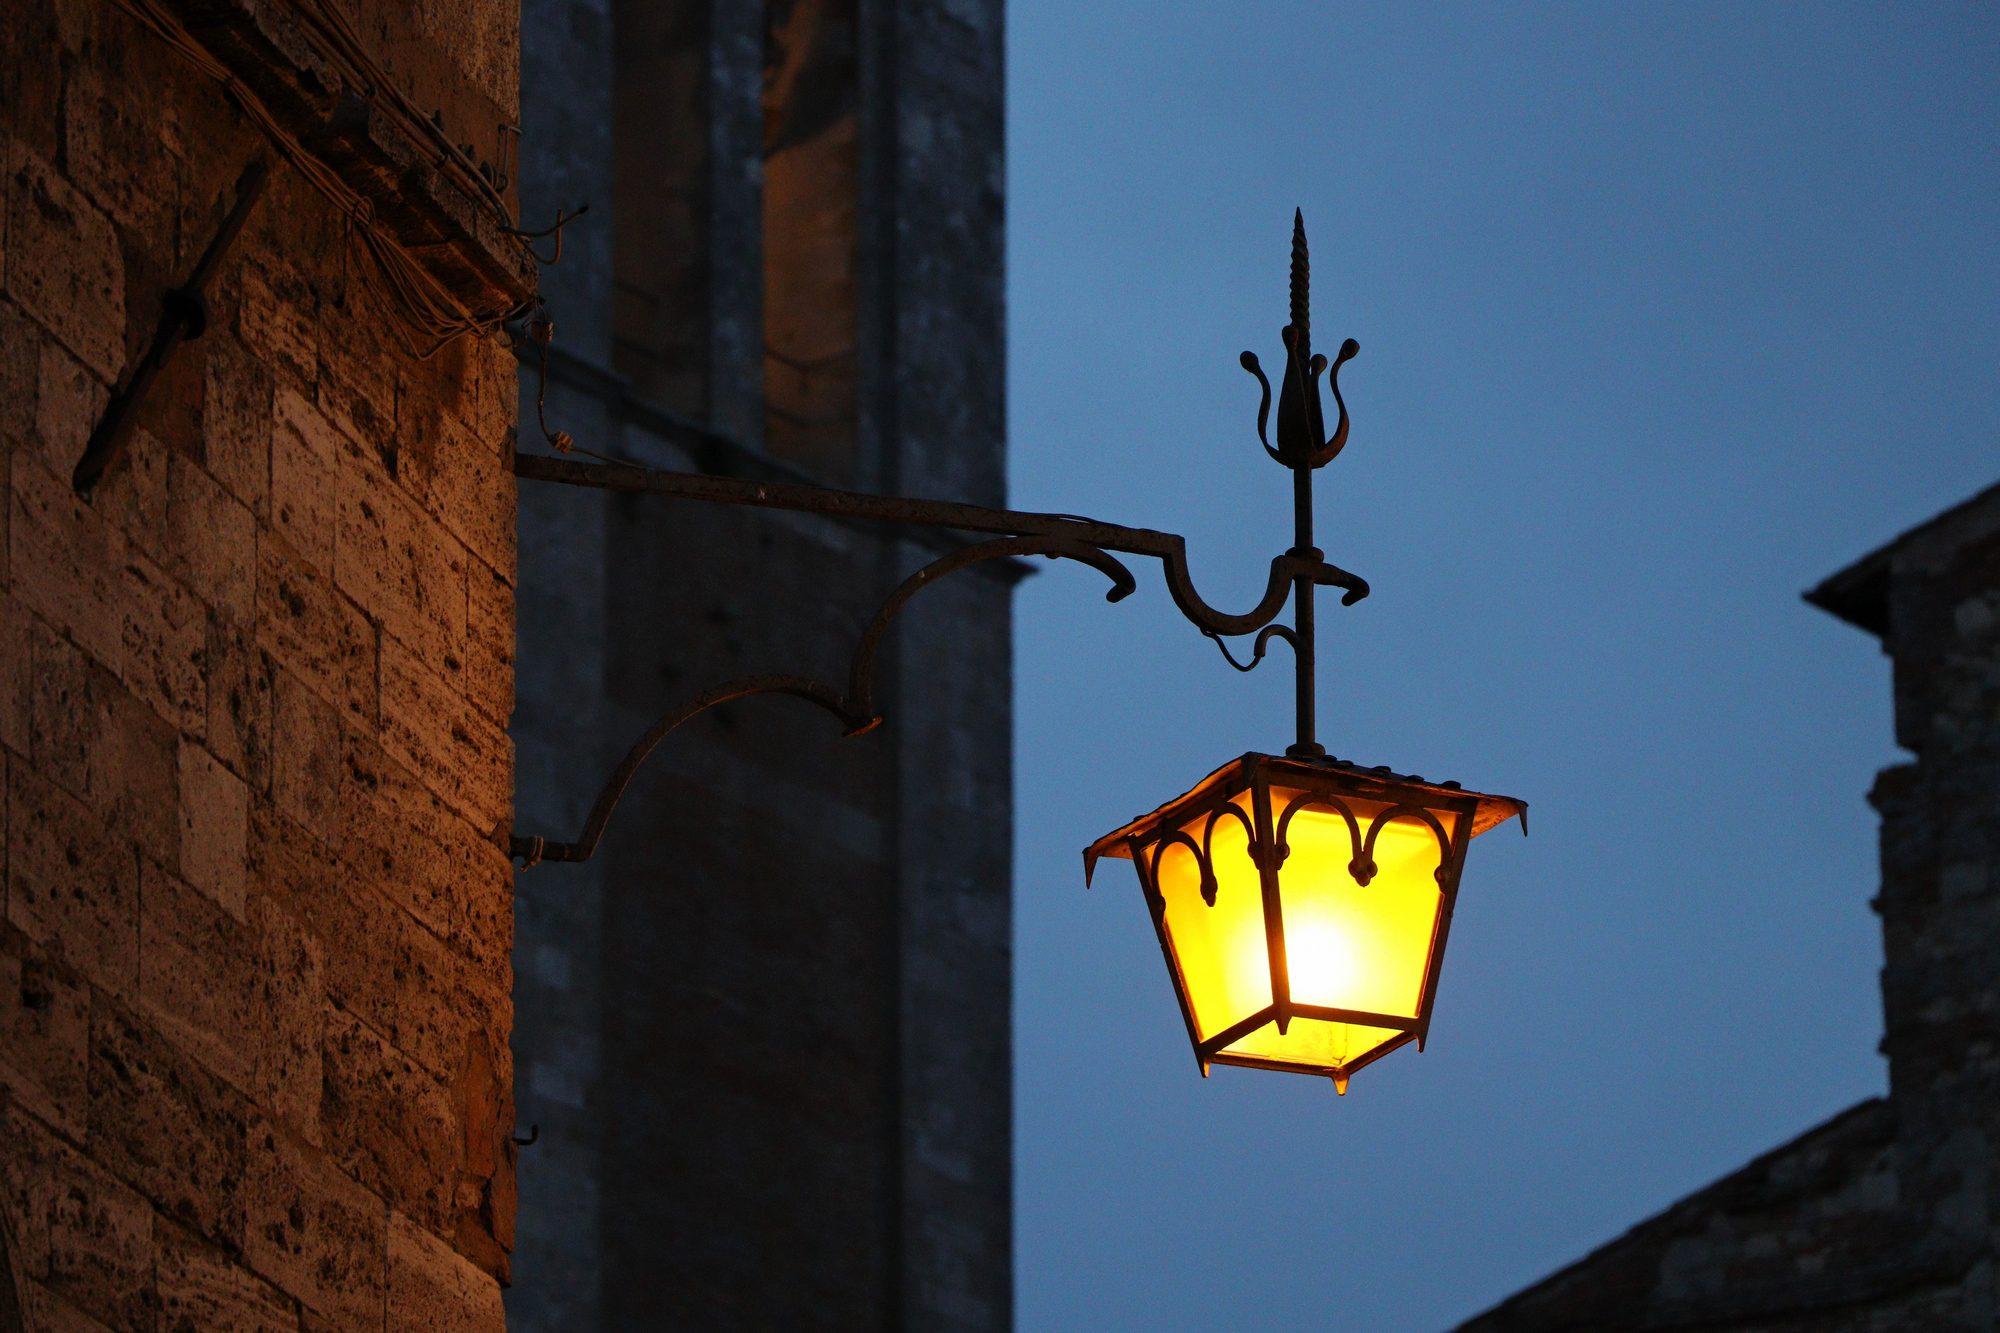 Laterne in Montepulciano in der Toskana Italien